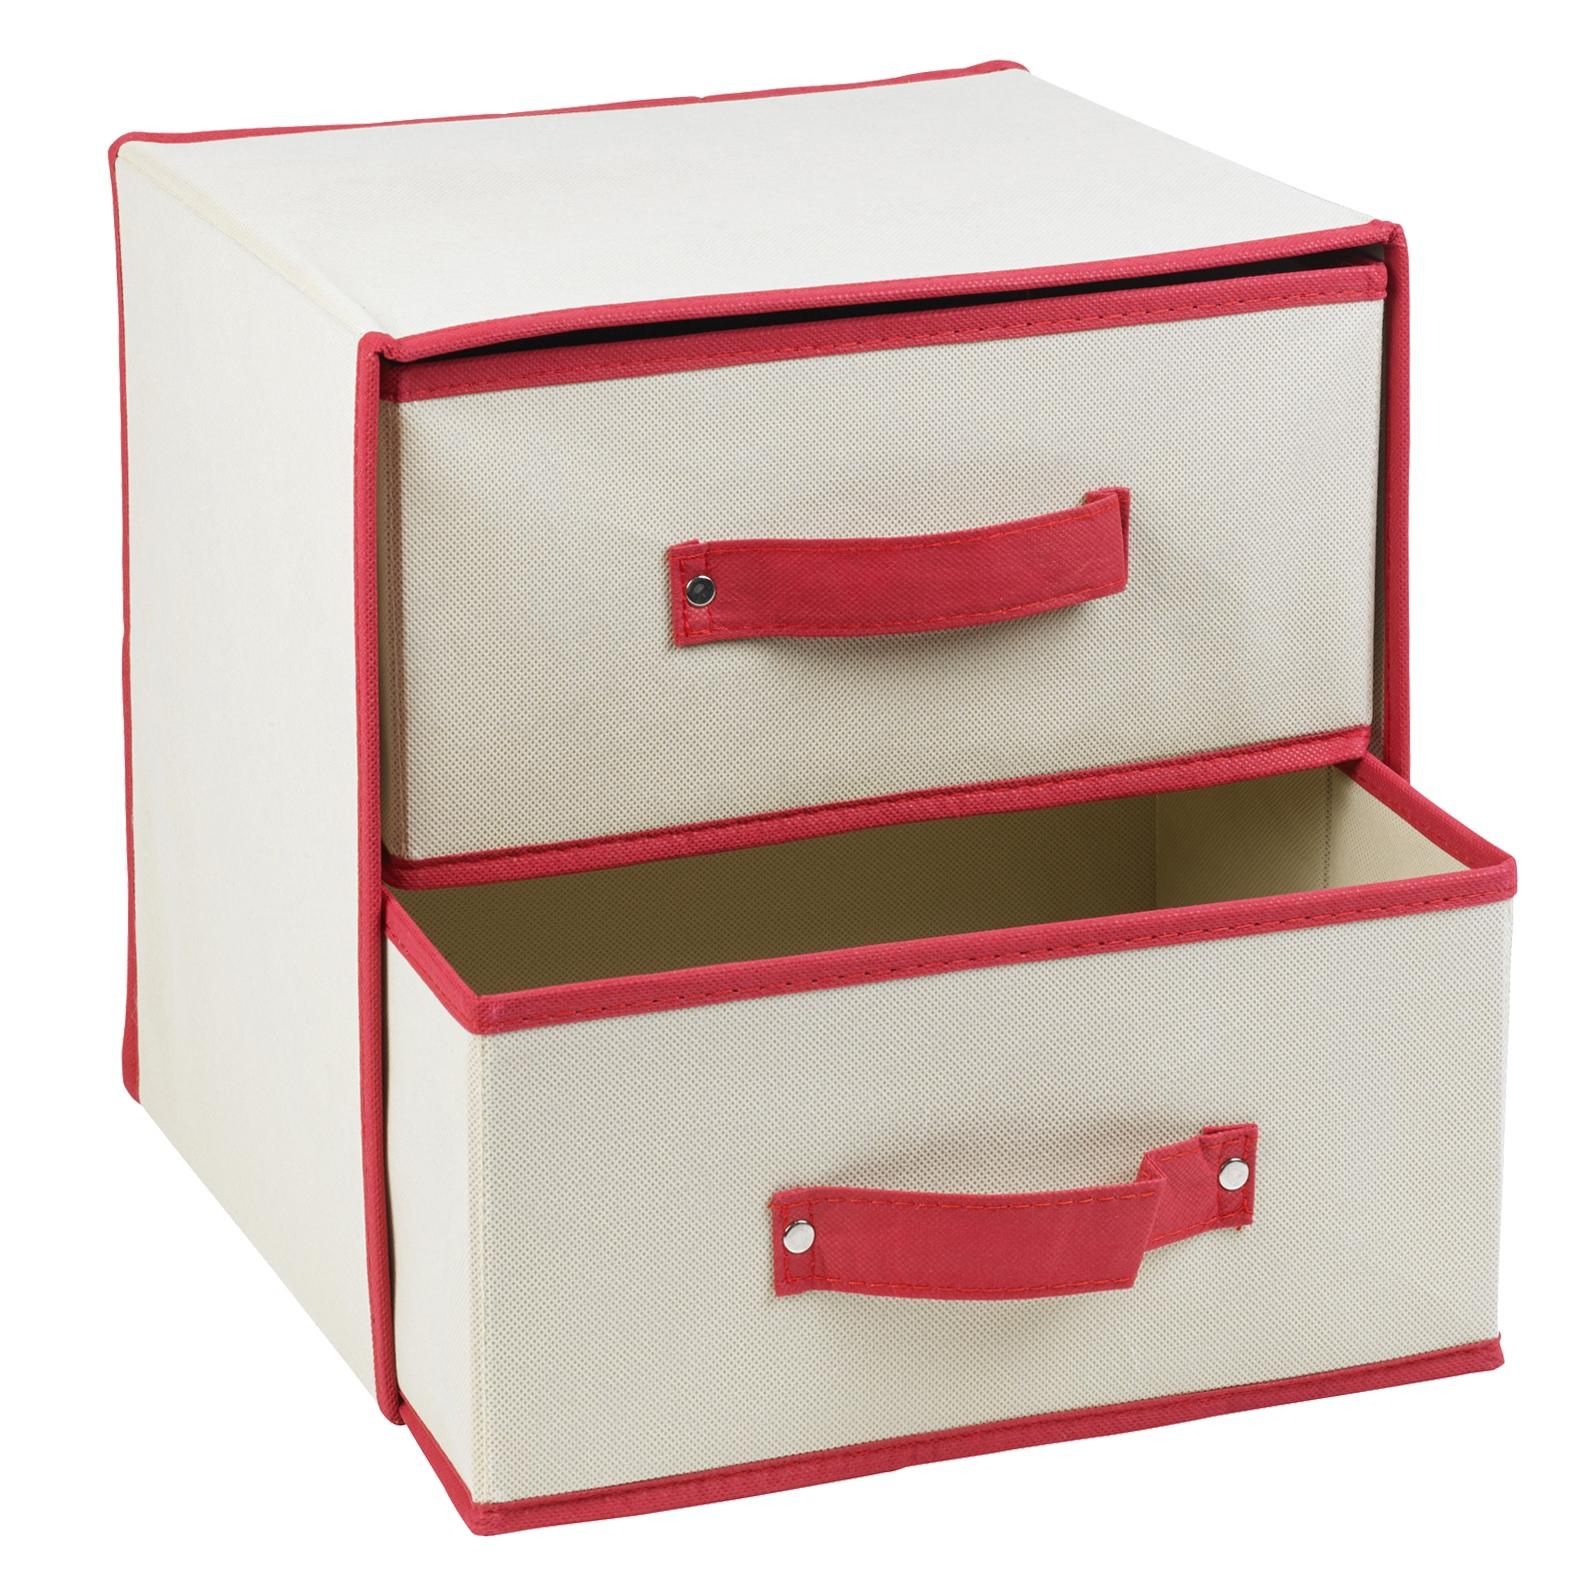 Apilables tela 2 caj n cajas almacenaje contenedores - Cajas tela almacenaje ...